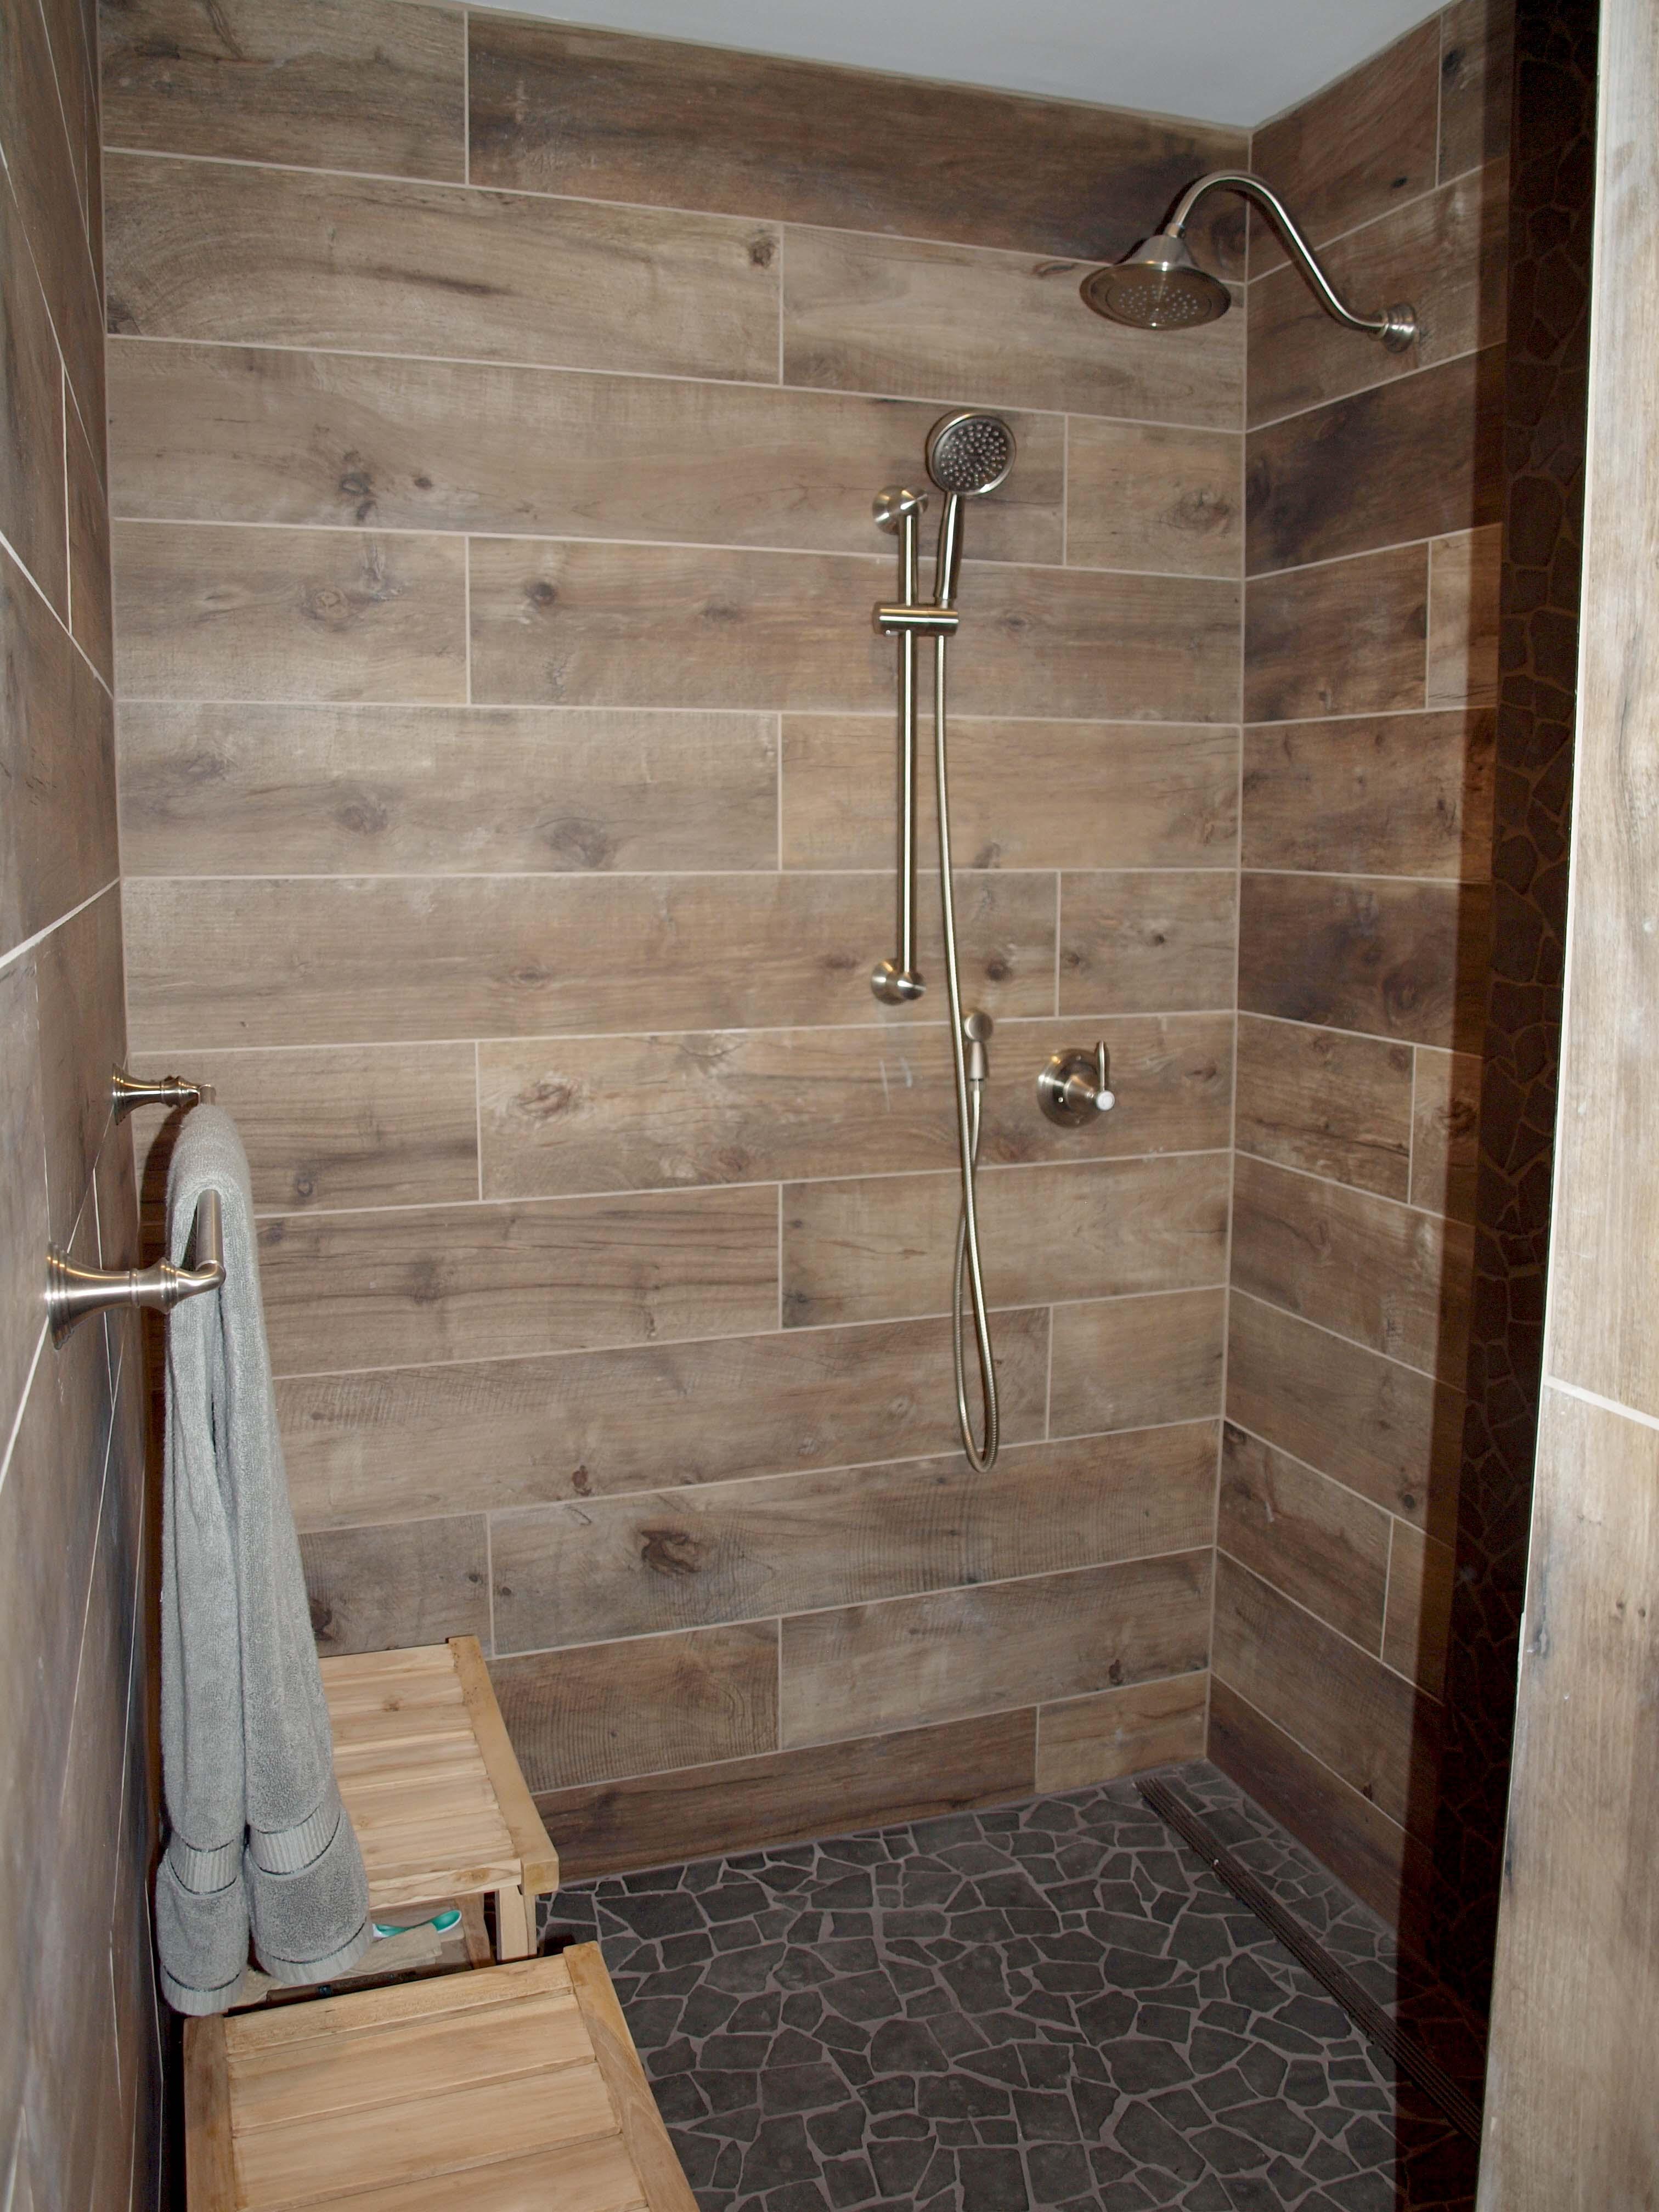 title | Wood Look Tile Bathroom